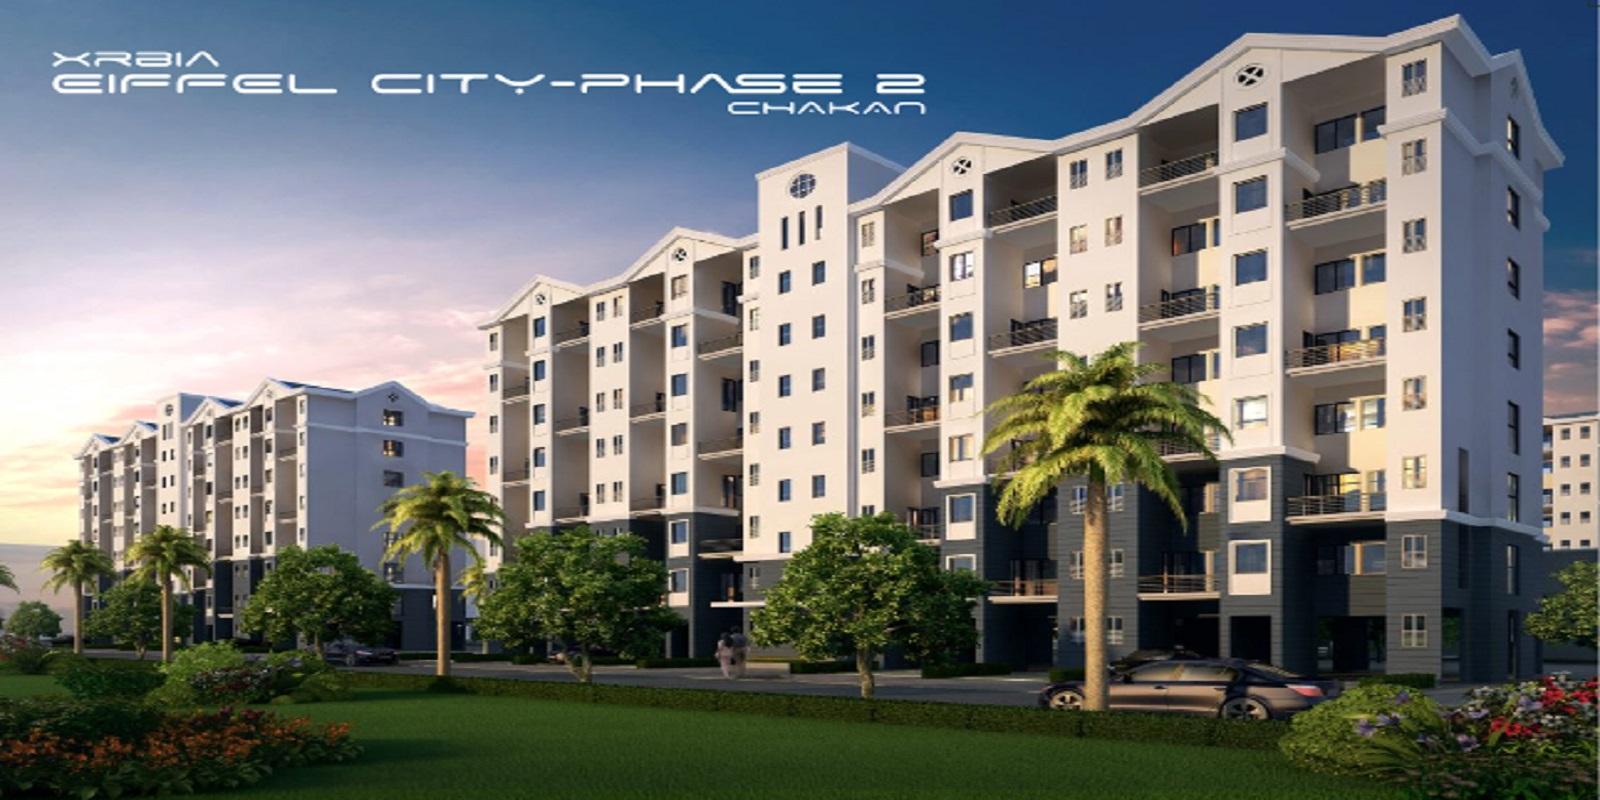 xrbia eiffel city phase 2 project large image3